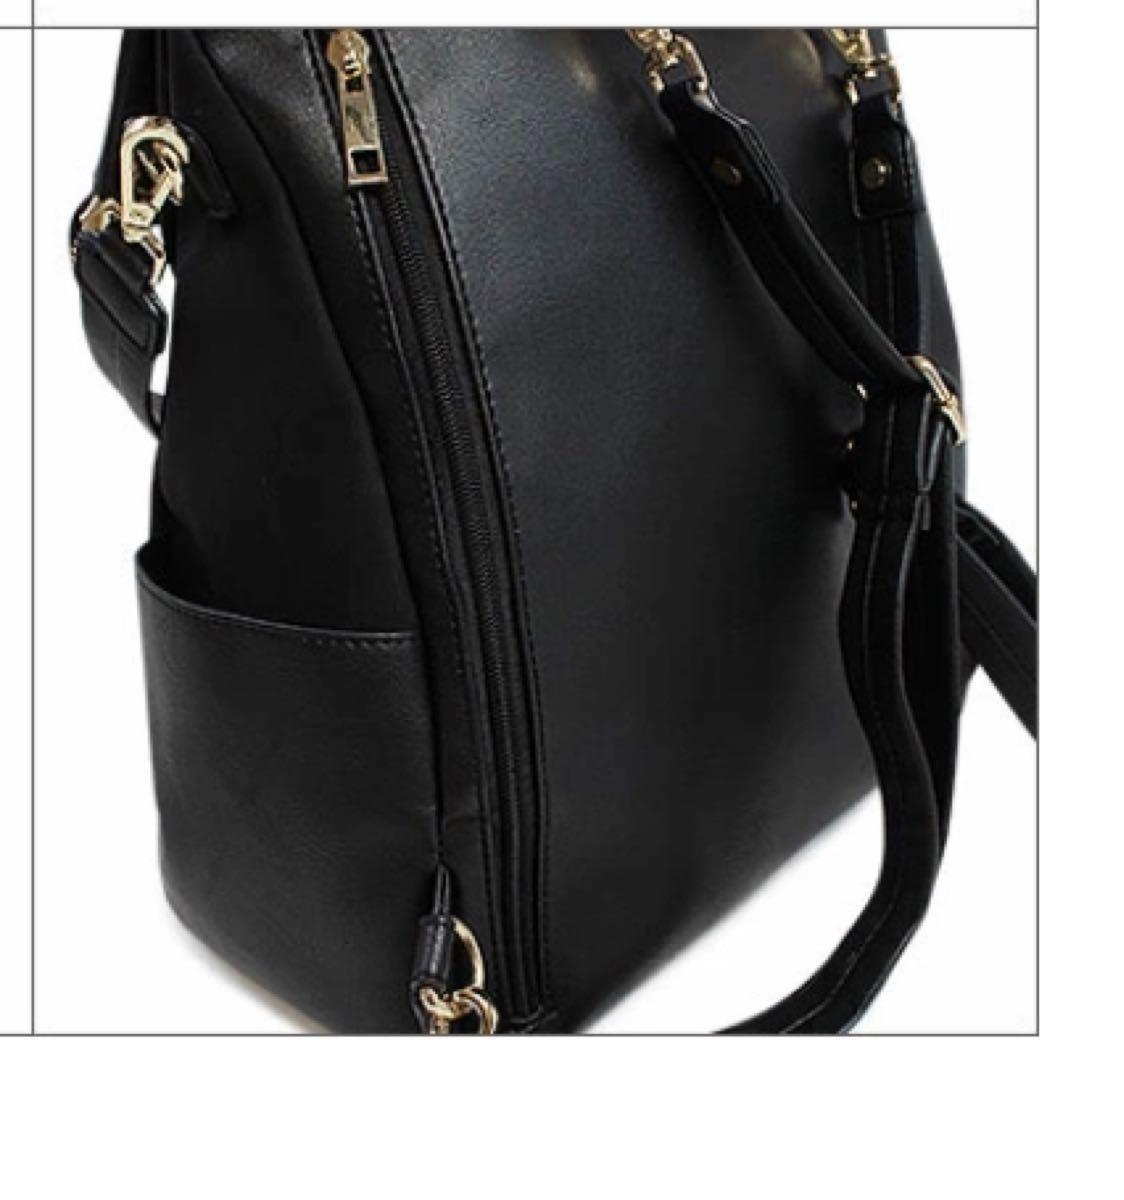 ♯VIVAYOU ♯リュック ♯ママバッグ ♯ブラック ♯マザーズバッグ ♯バッグパック 2way ショルダーバッグ ハンドバッグ